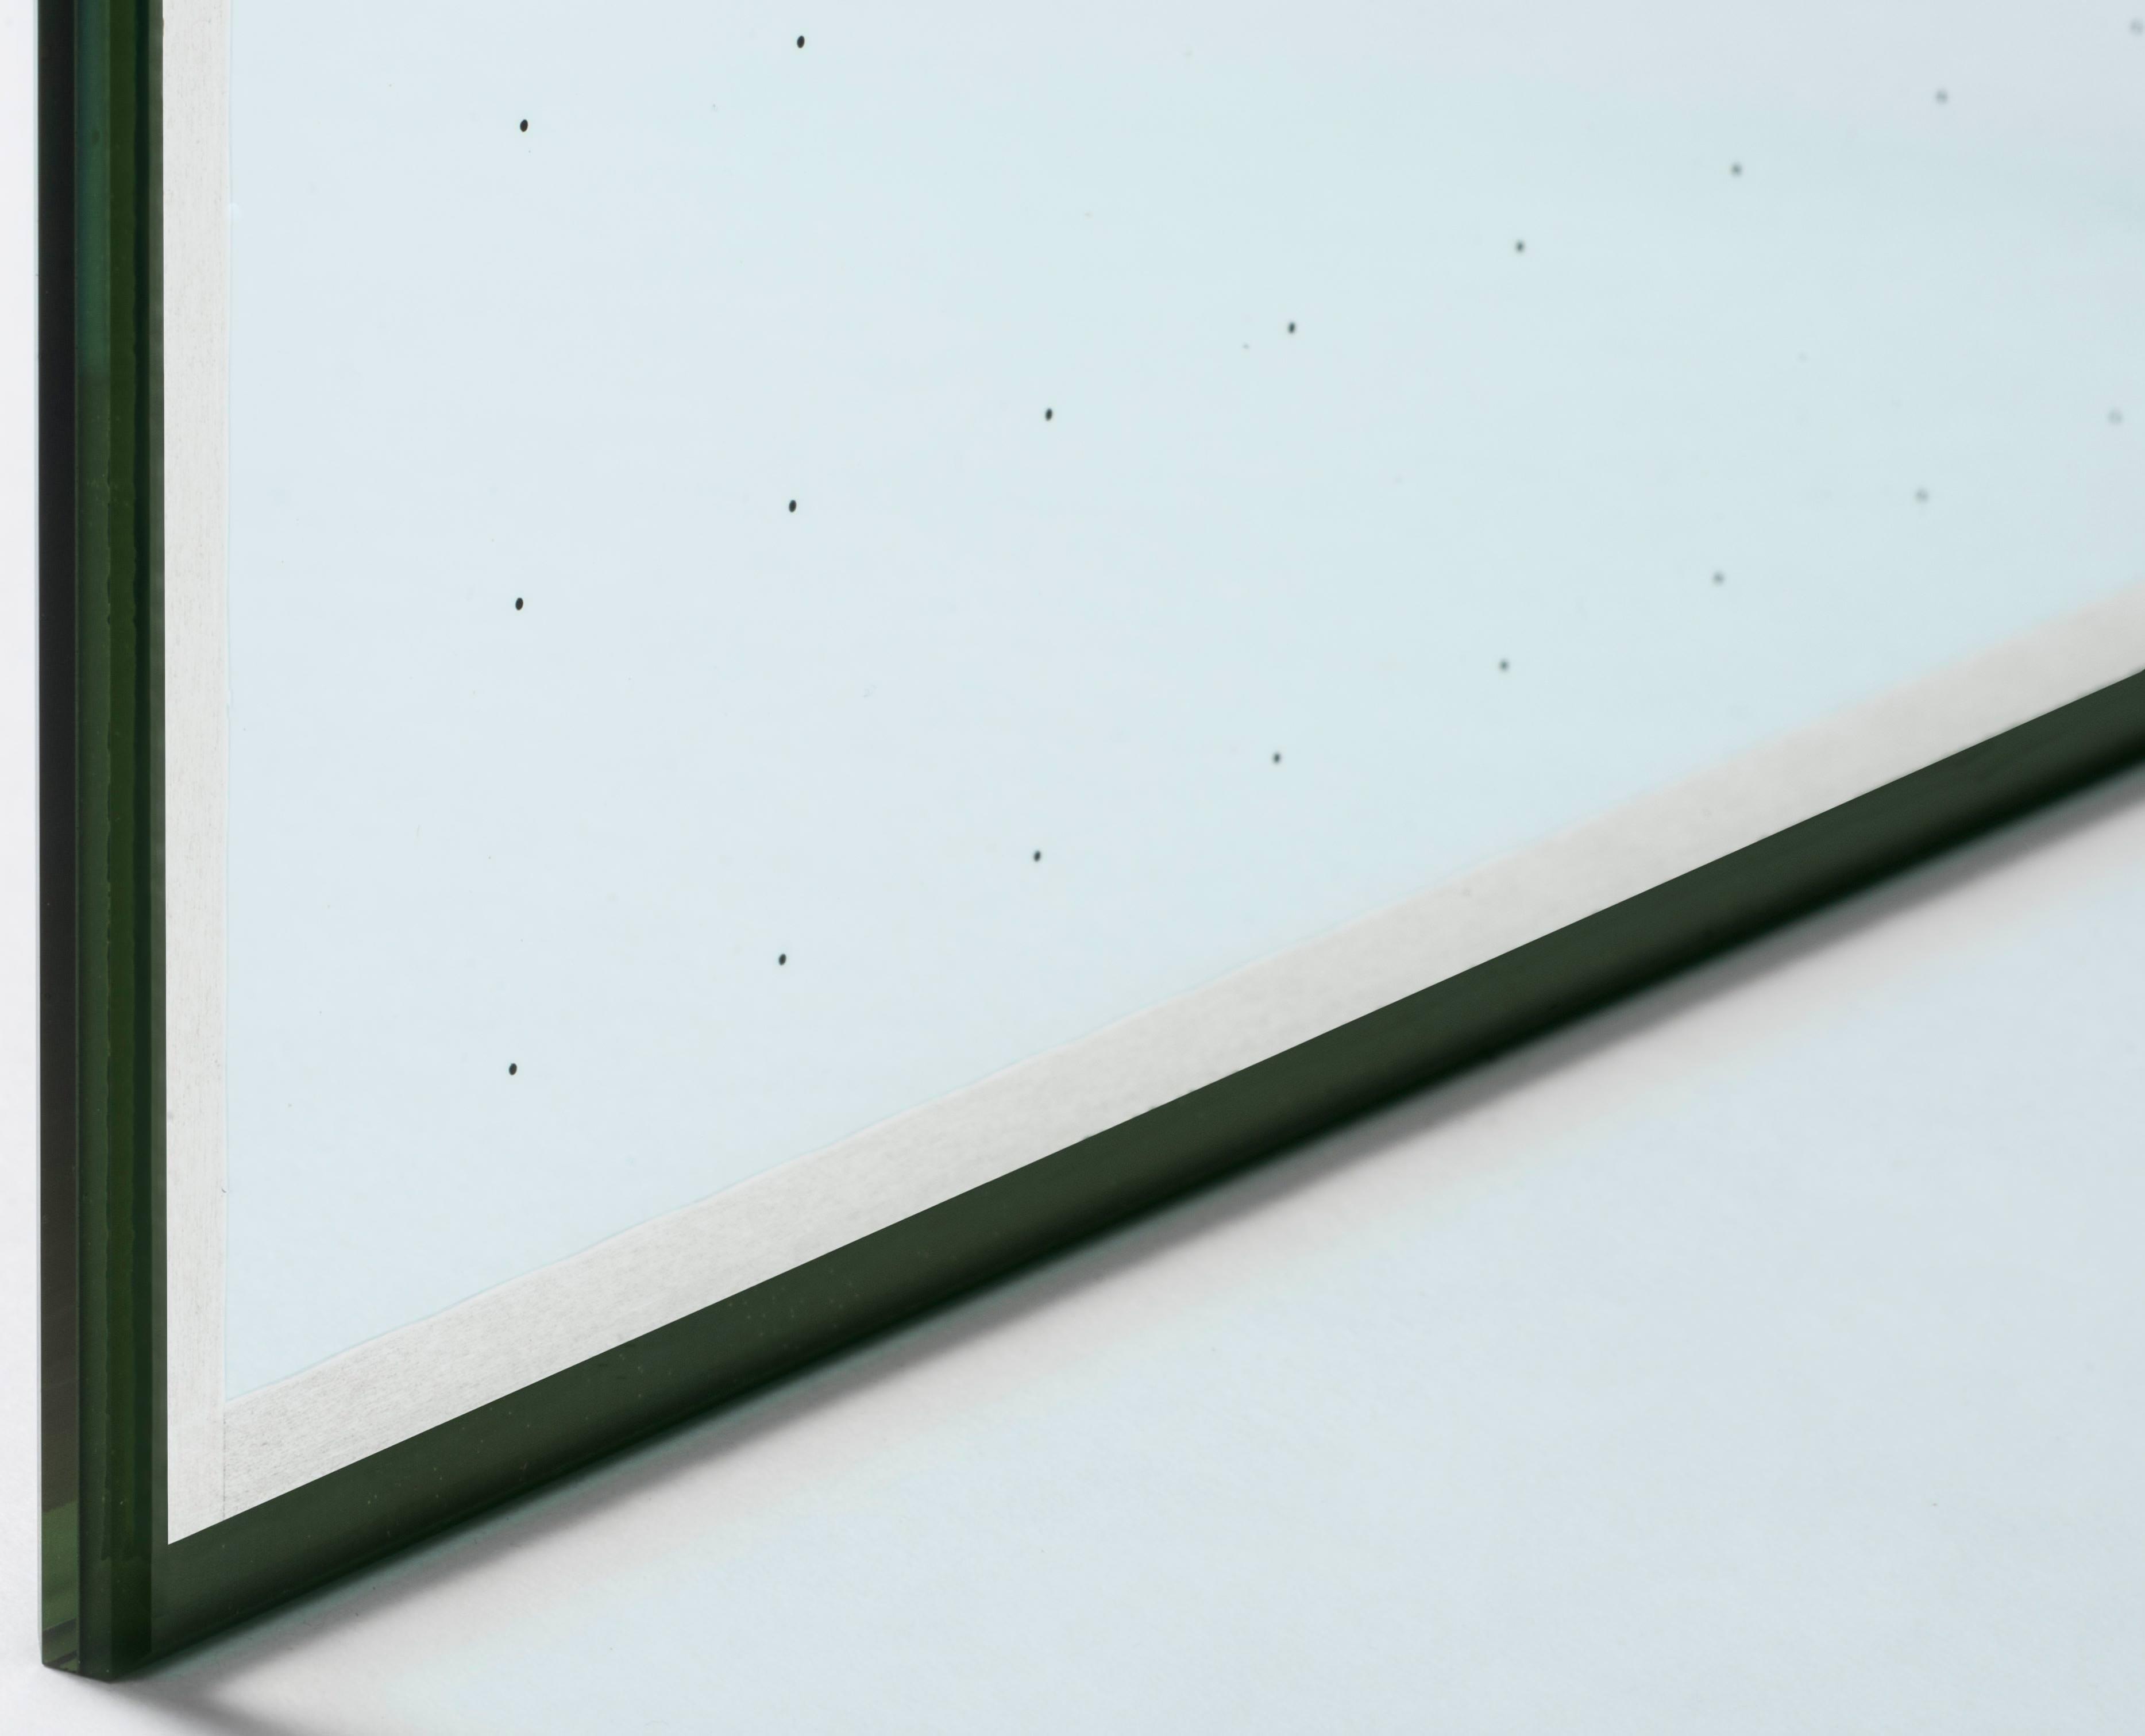 Fineo Agc Glass Europe Investiert In Vakuum Isolierglas